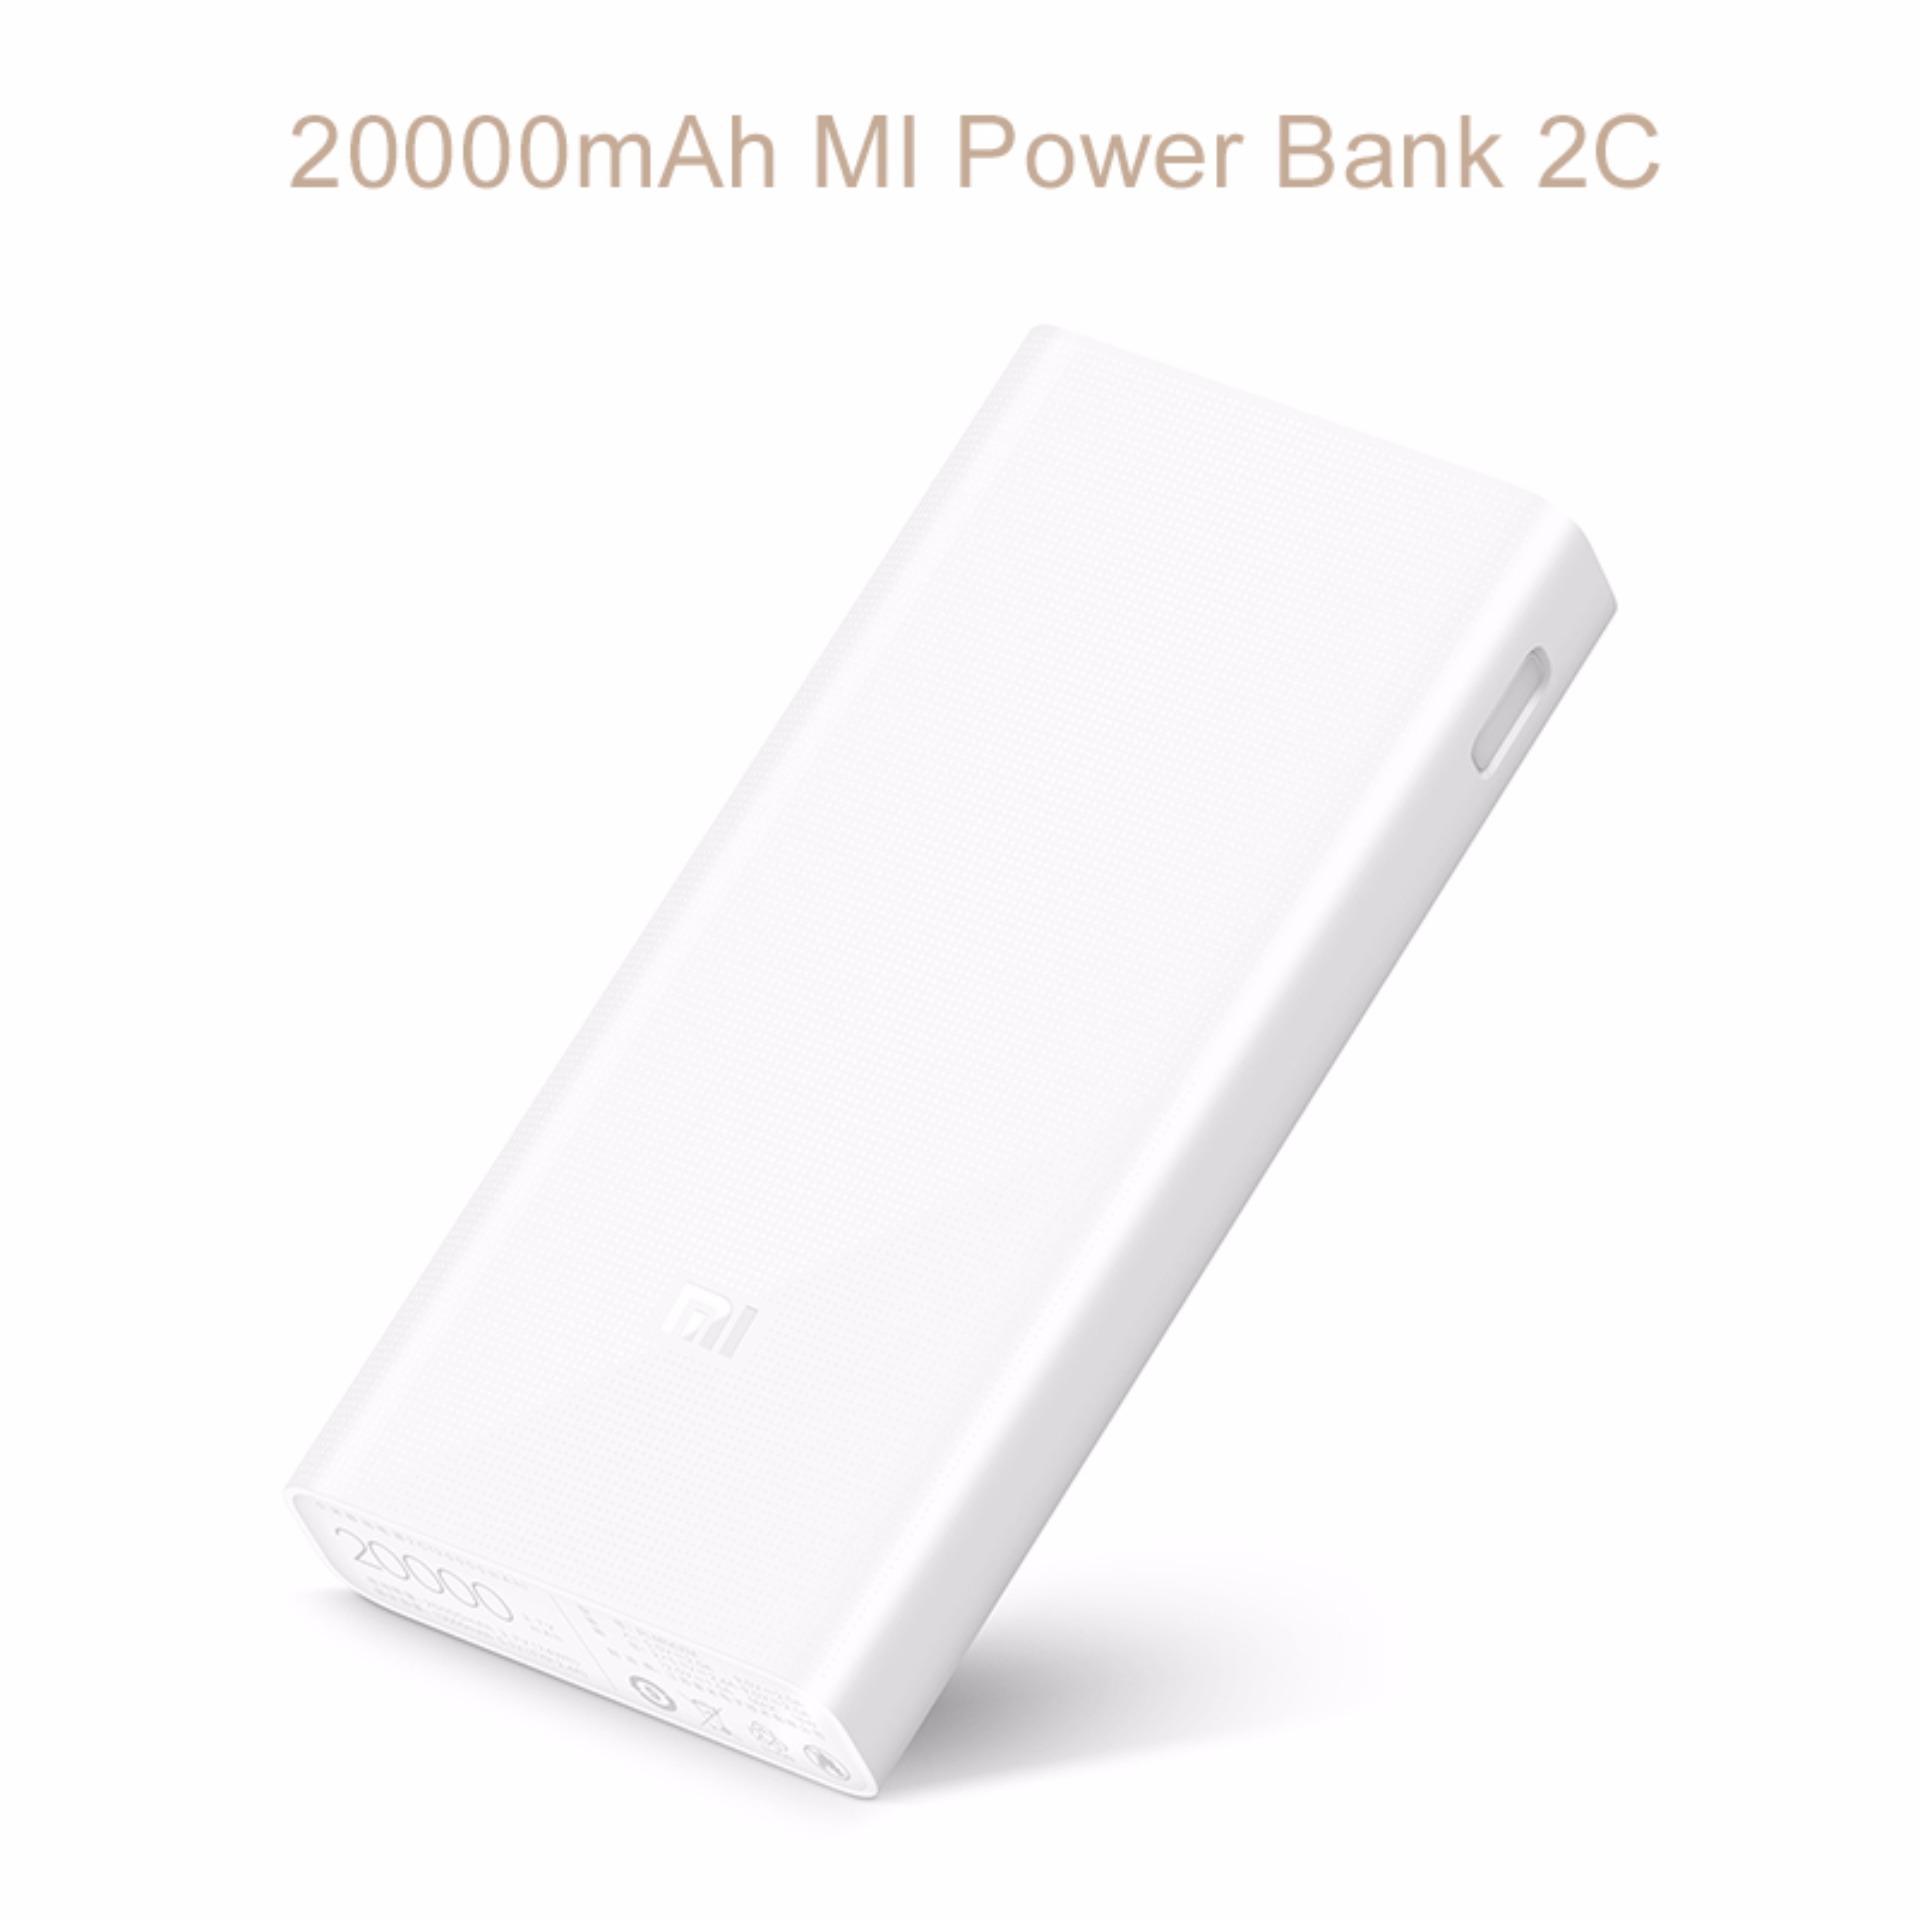 Xiaomi Mi Powerbank 20000mAh 2C QC 3.0 Portable Universal Power banks (White)